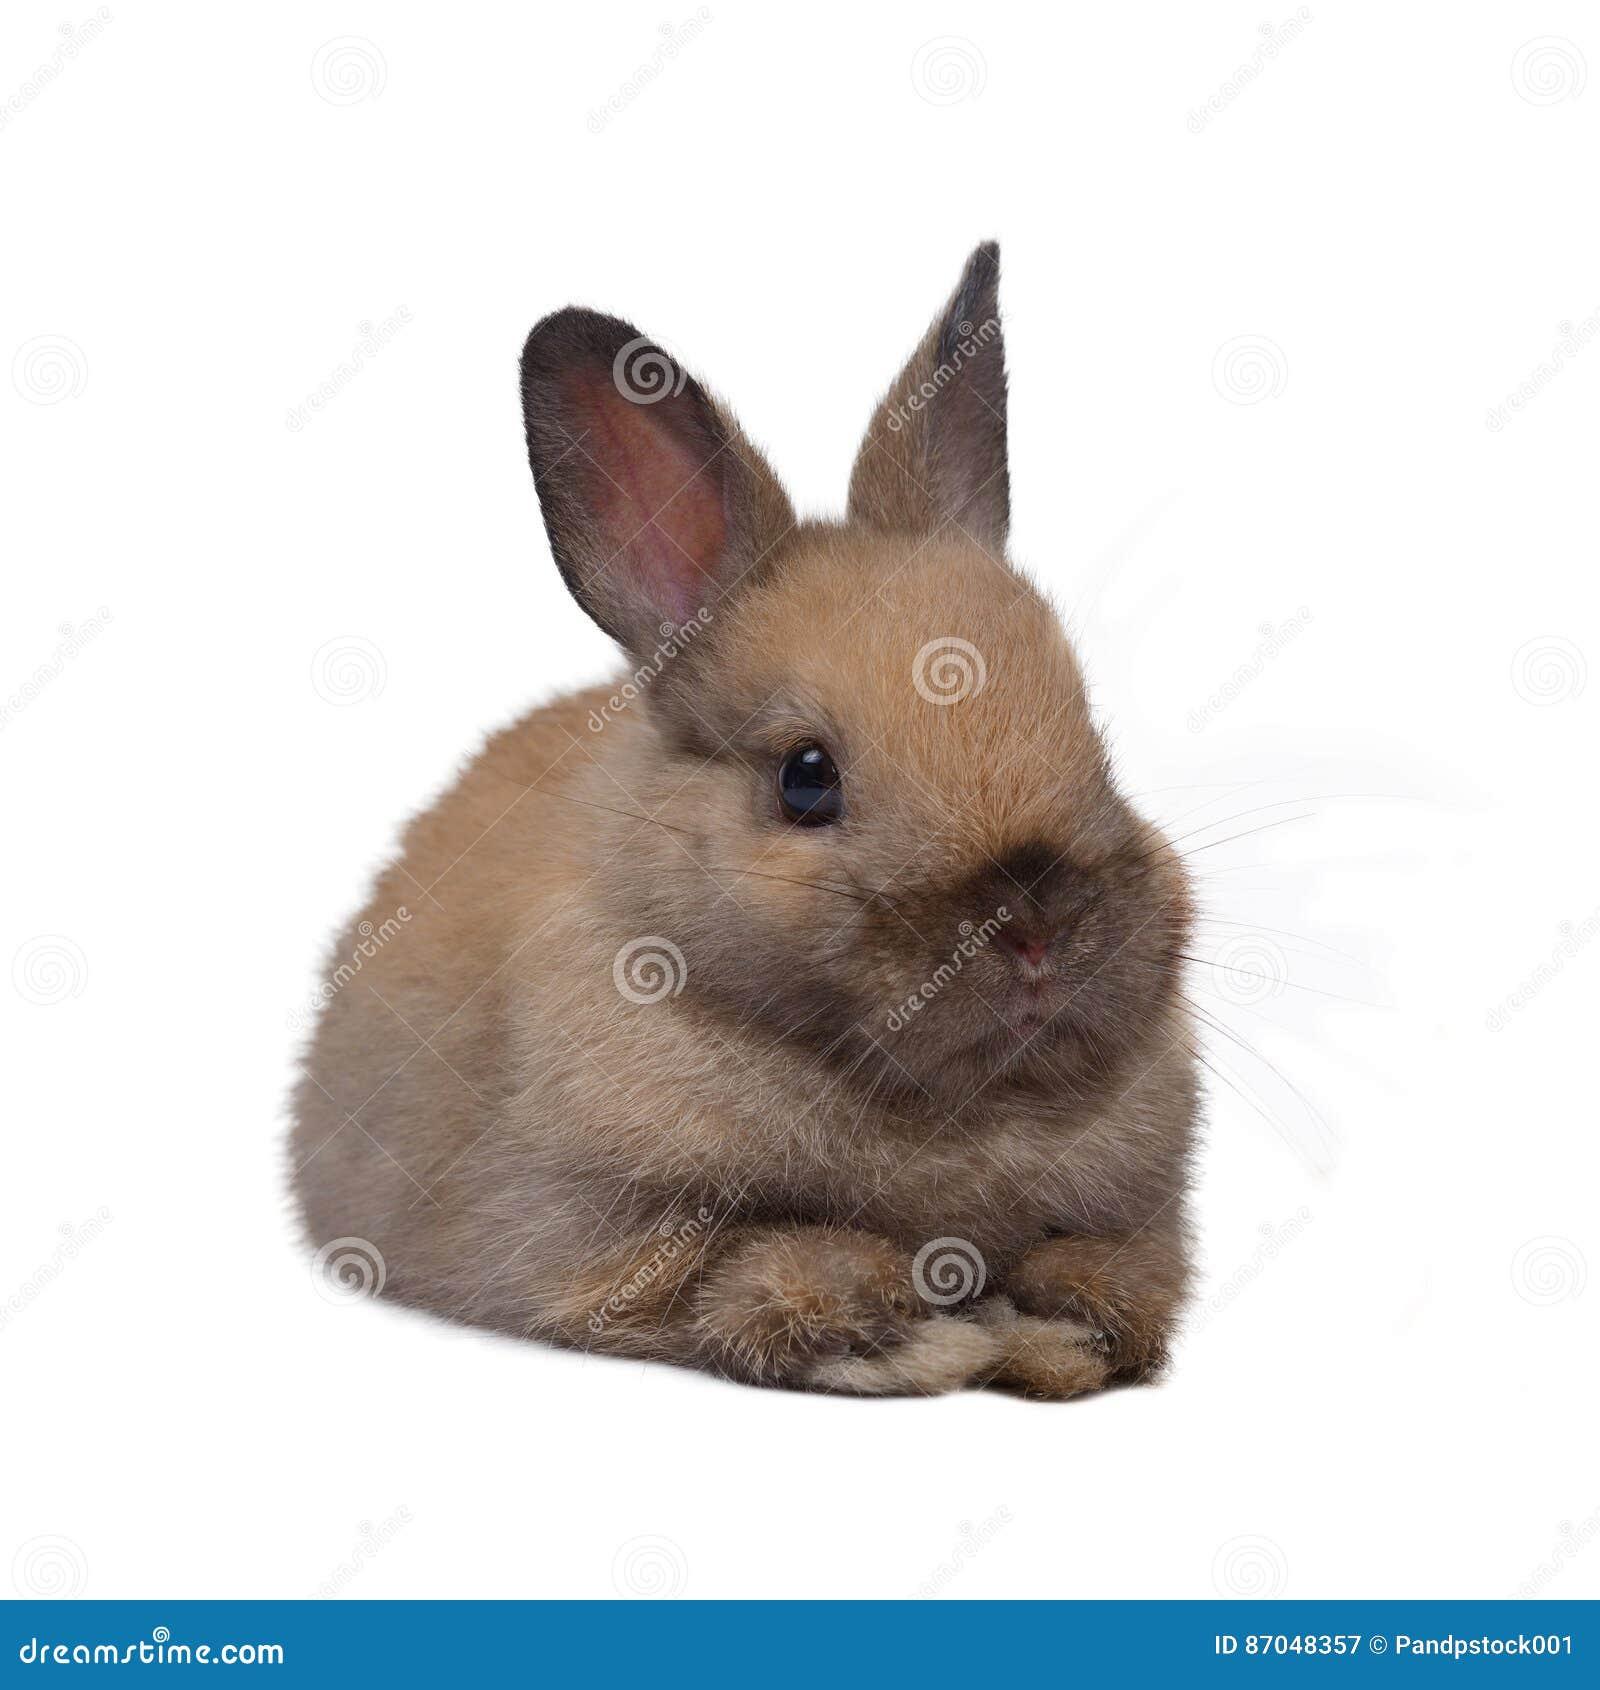 Netherland dwarf rabbit.